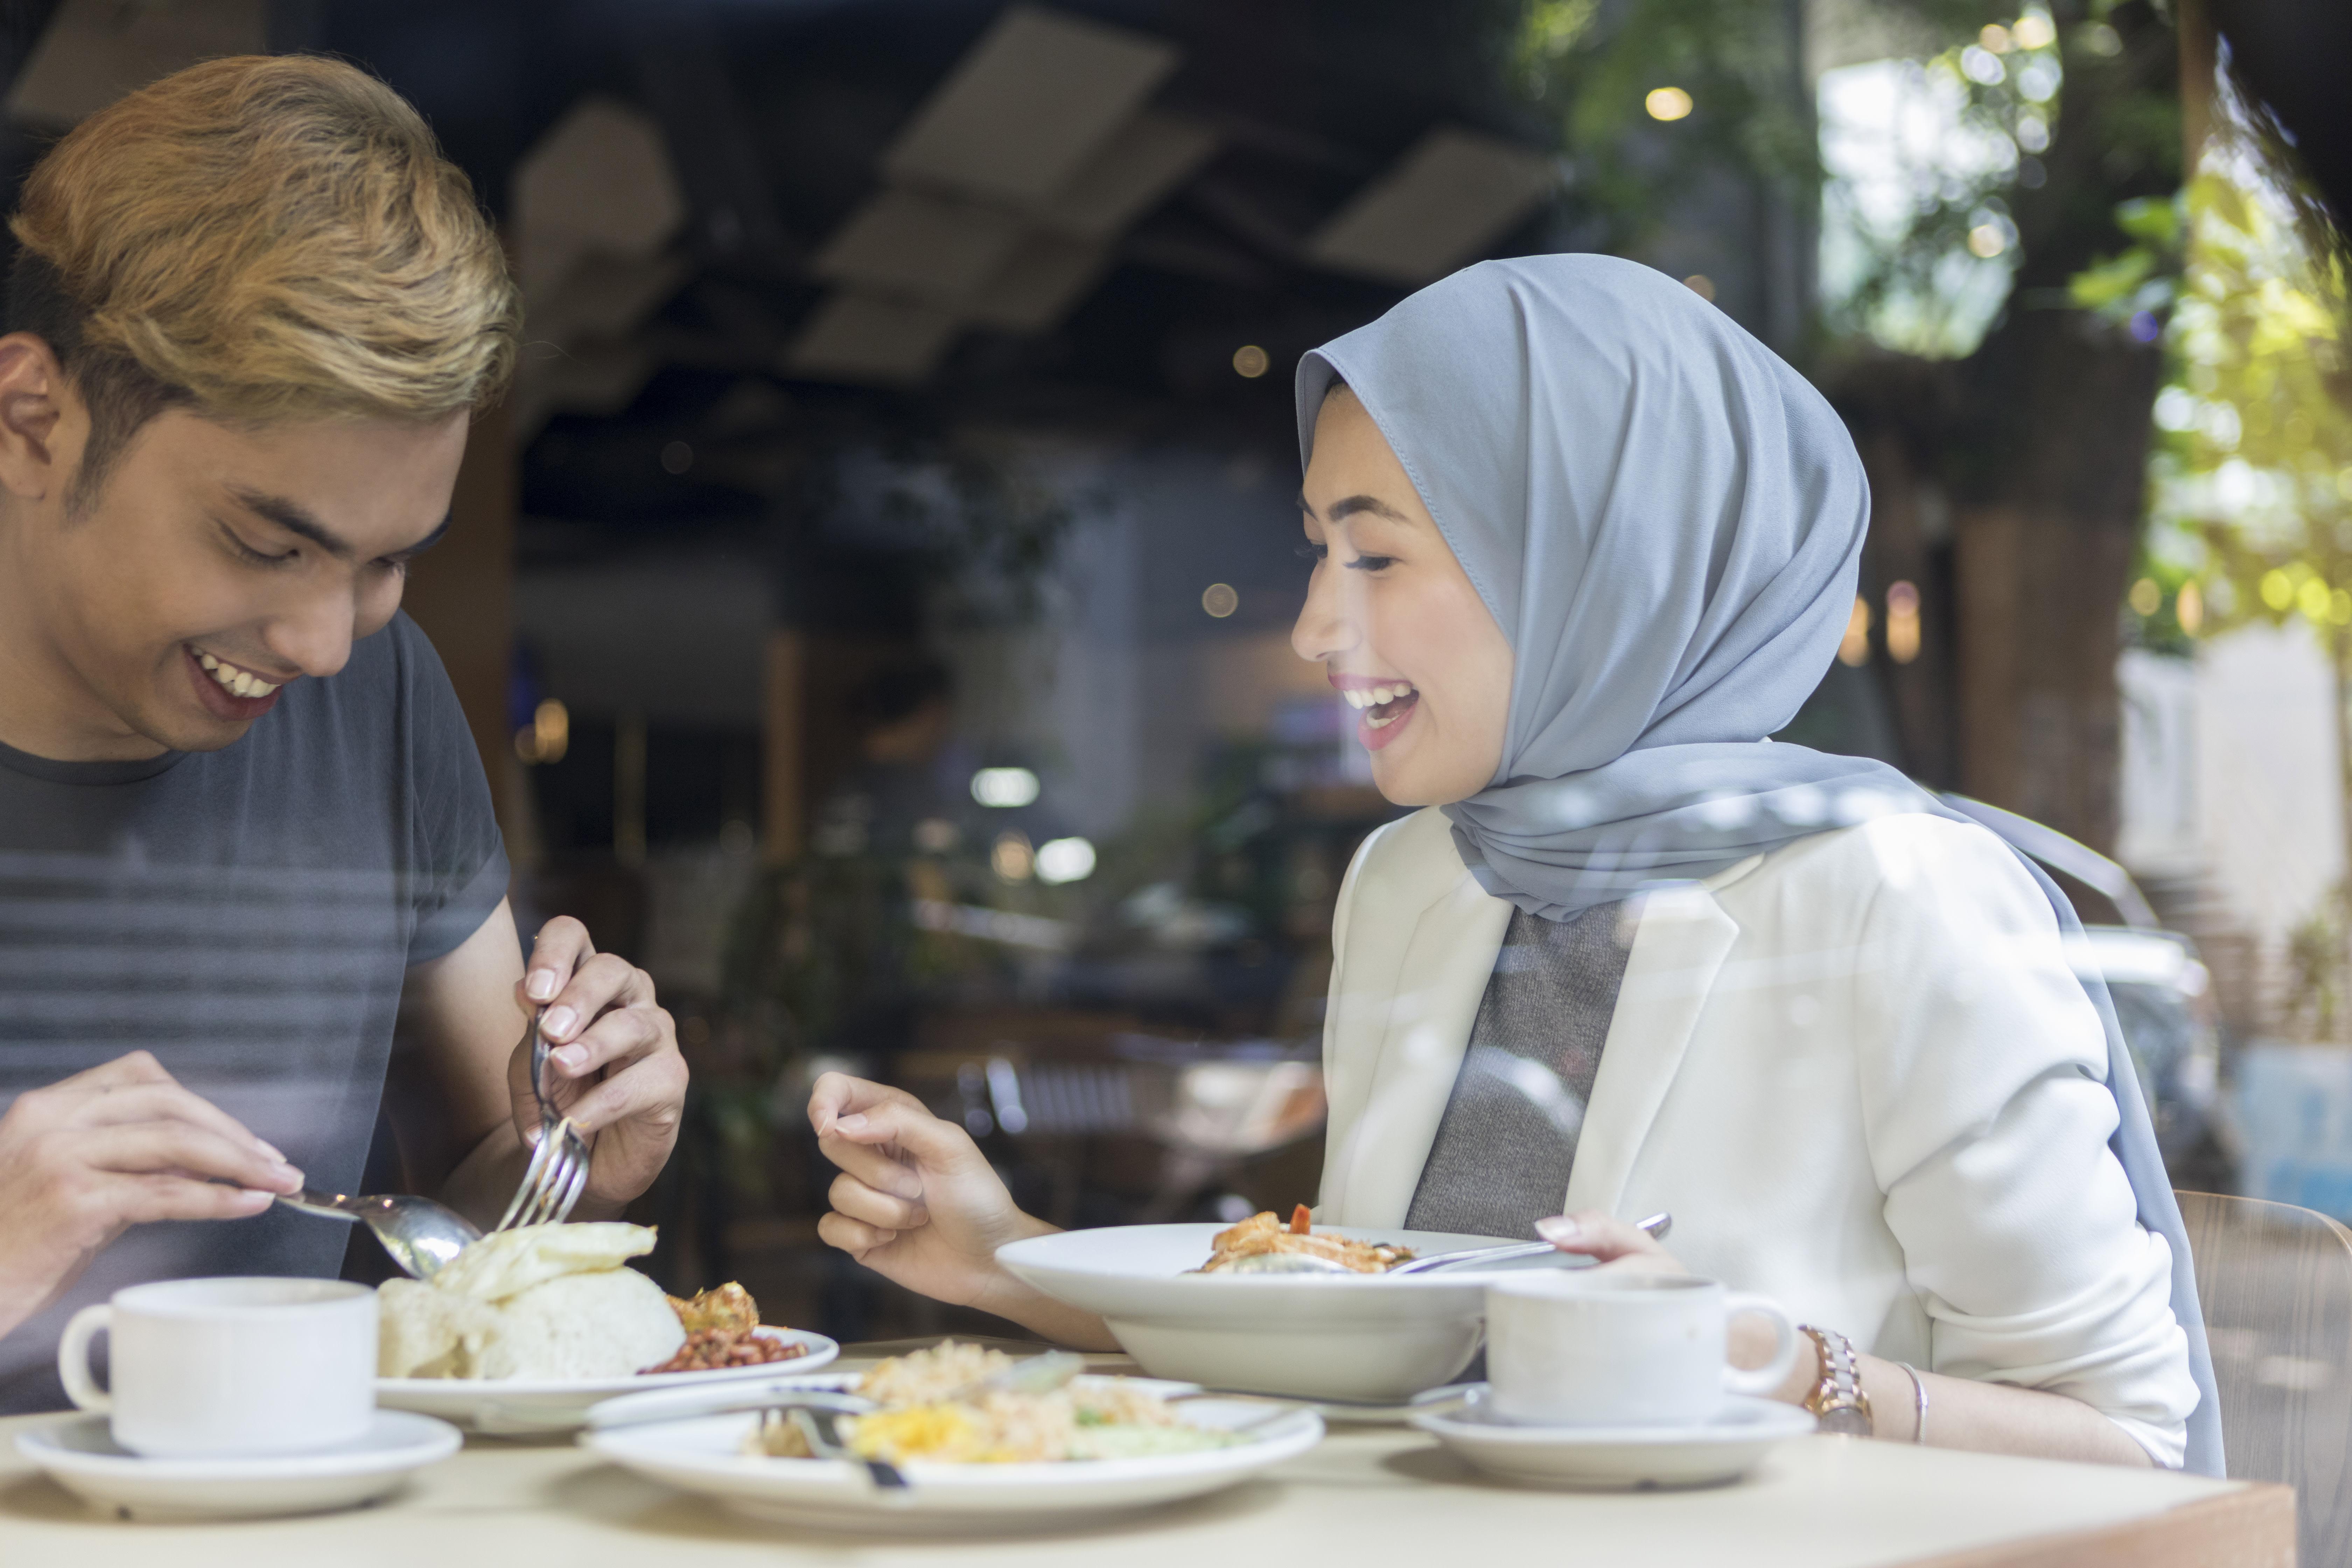 Free muslim dating sites uk The #1